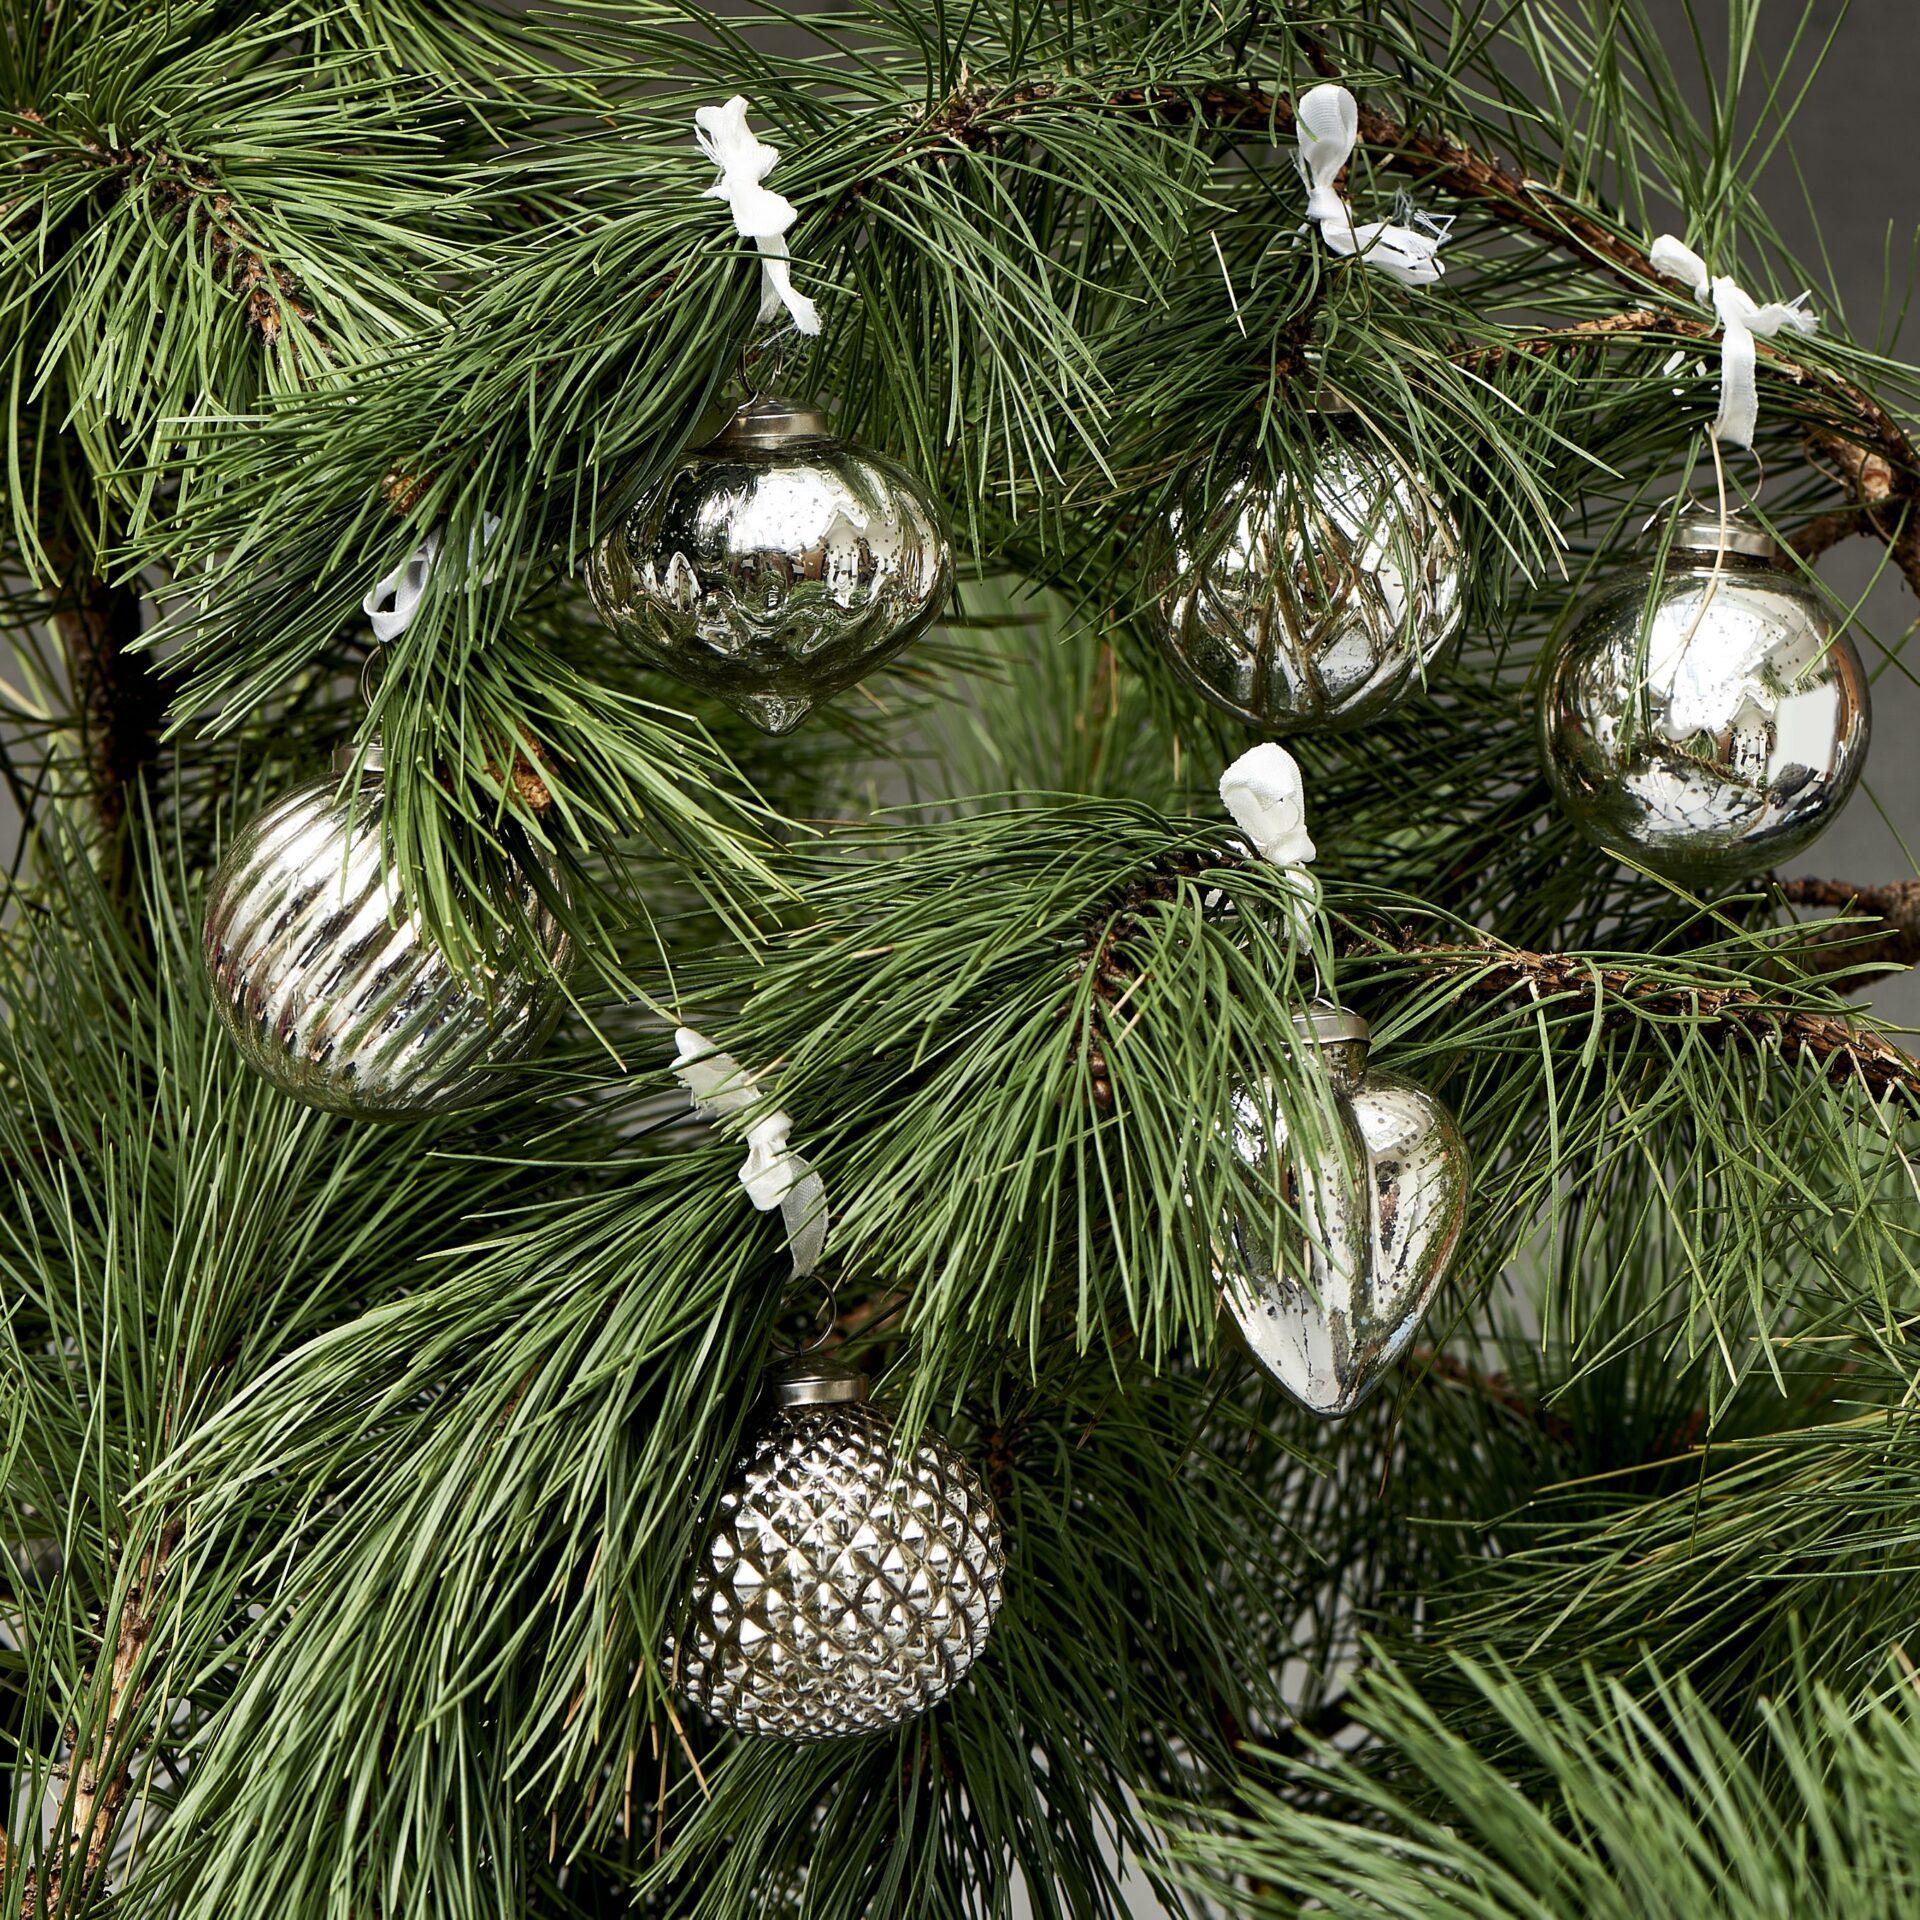 12 stk. Sølv julekugler – Happy Holiday Orn. sølv 12 pcs